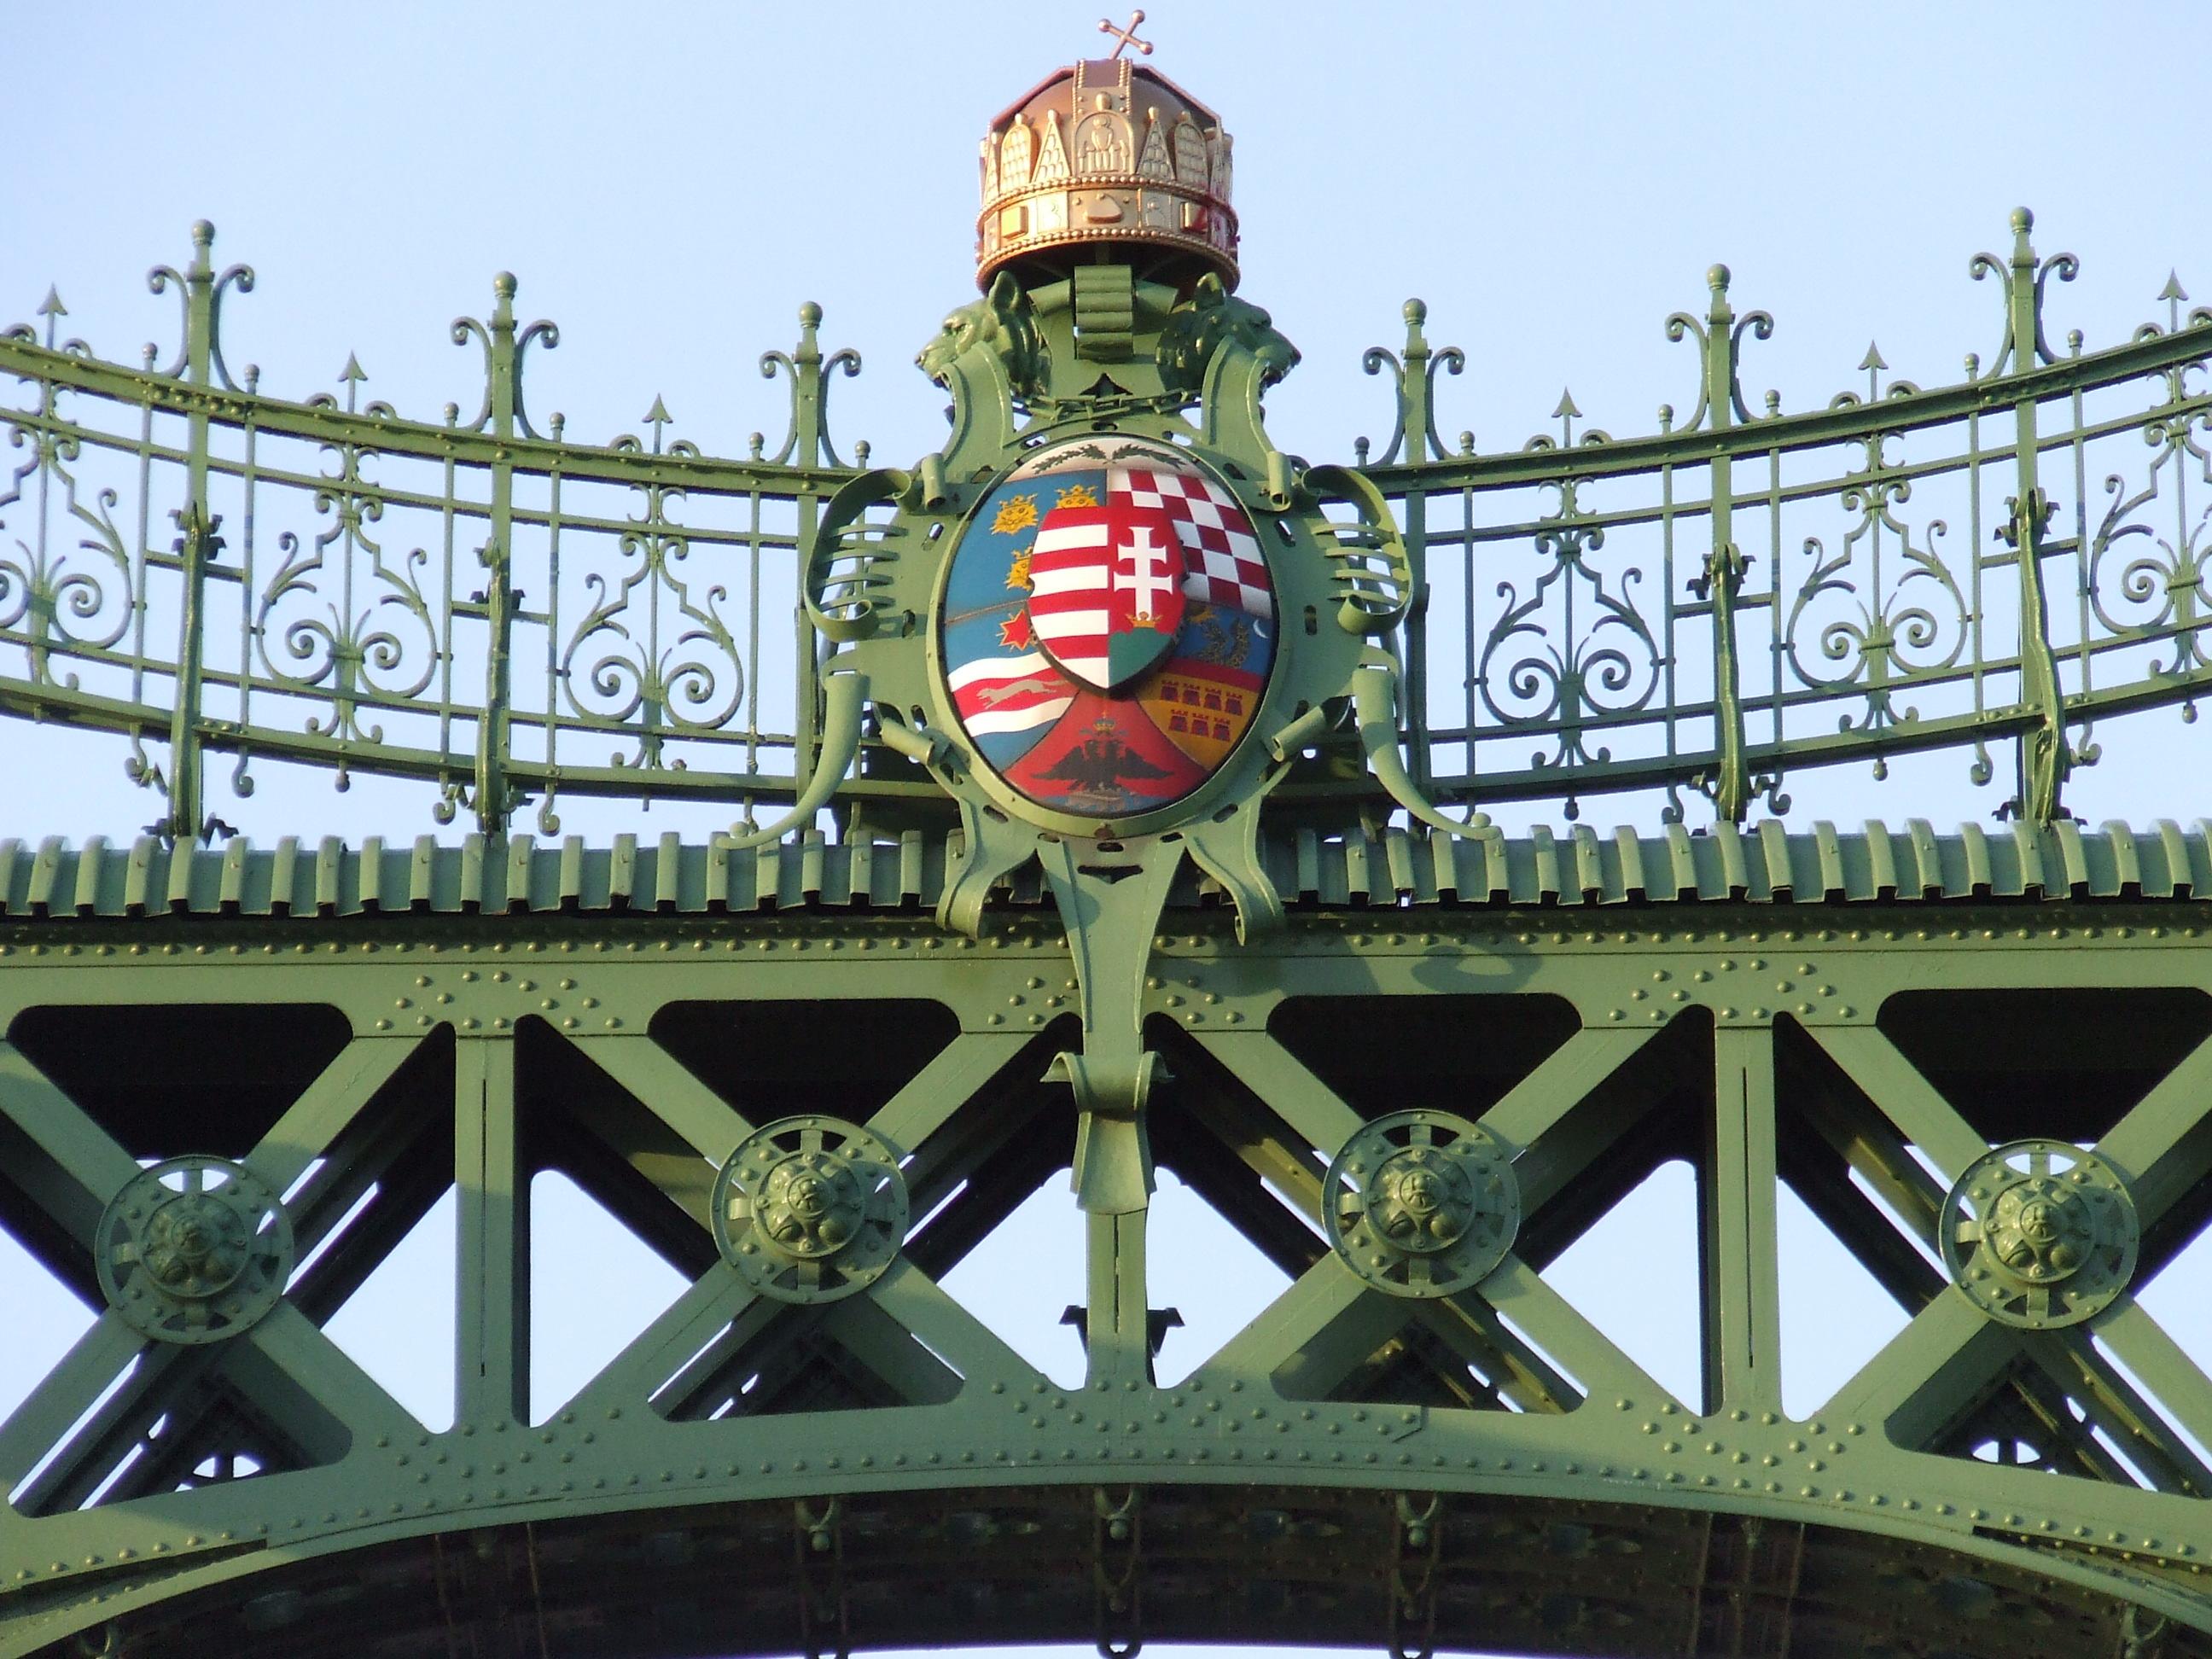 budapest_szabadsag_hid_17.jpg